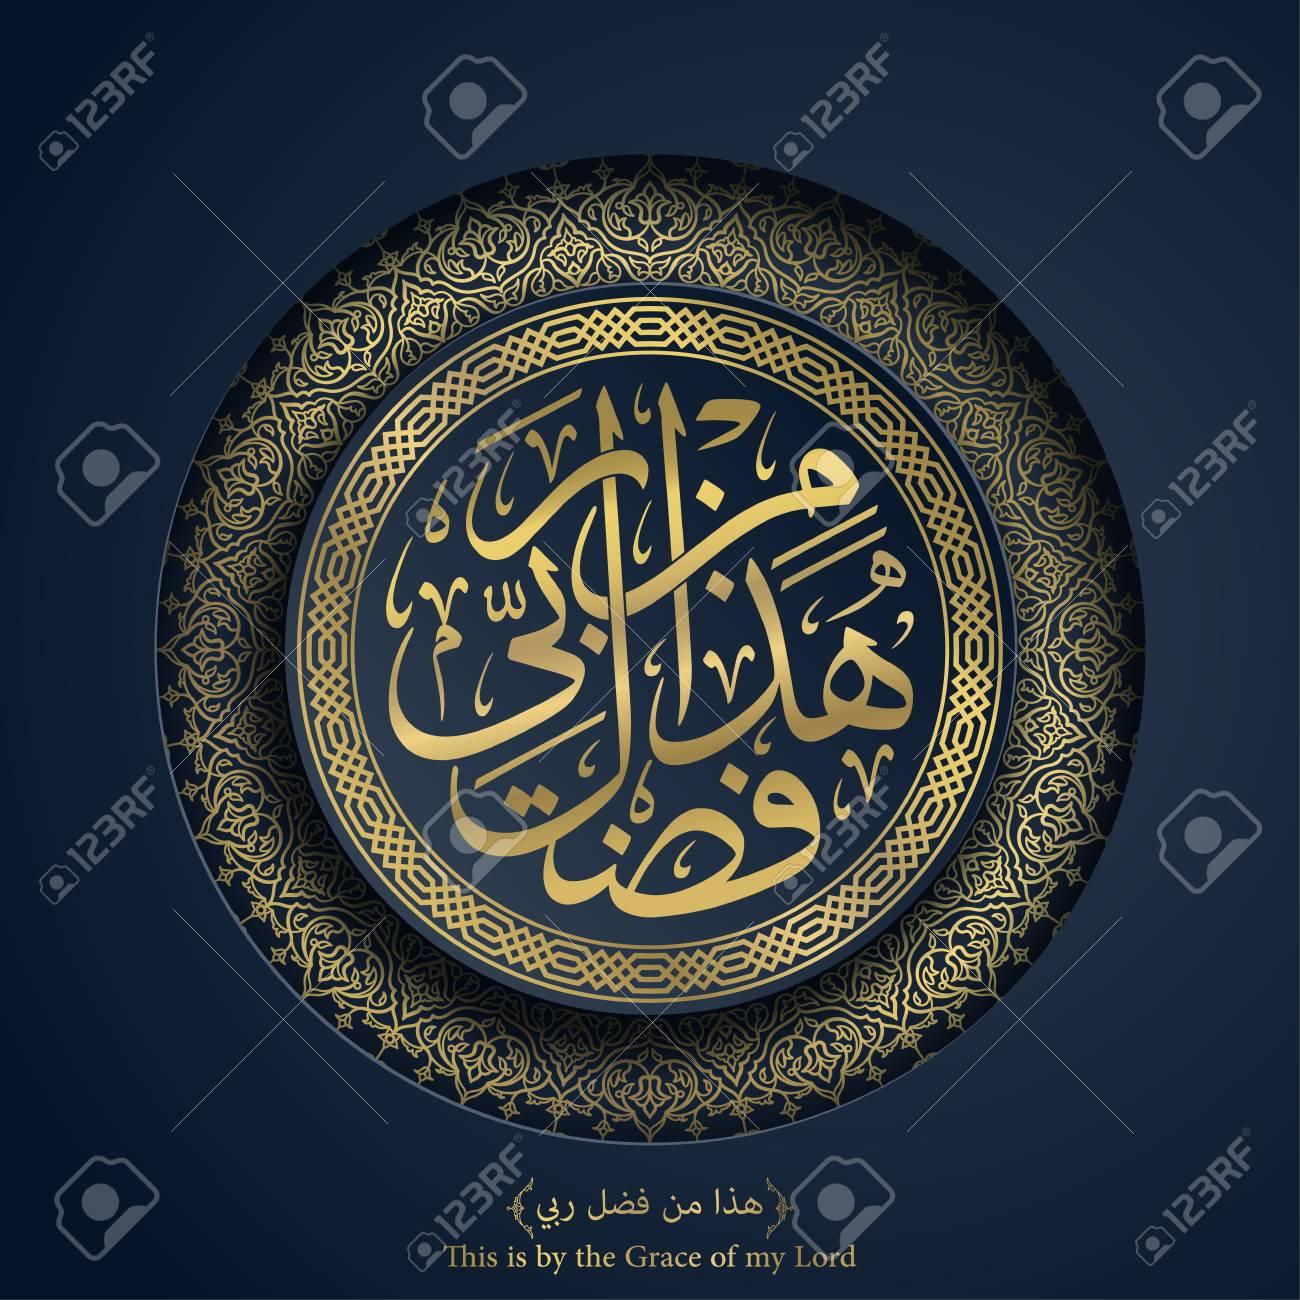 Islamic design Arabic calligraphy Arabic calligraphy Hadha min fadli Rabbi with circle pattern ornament - 120643710